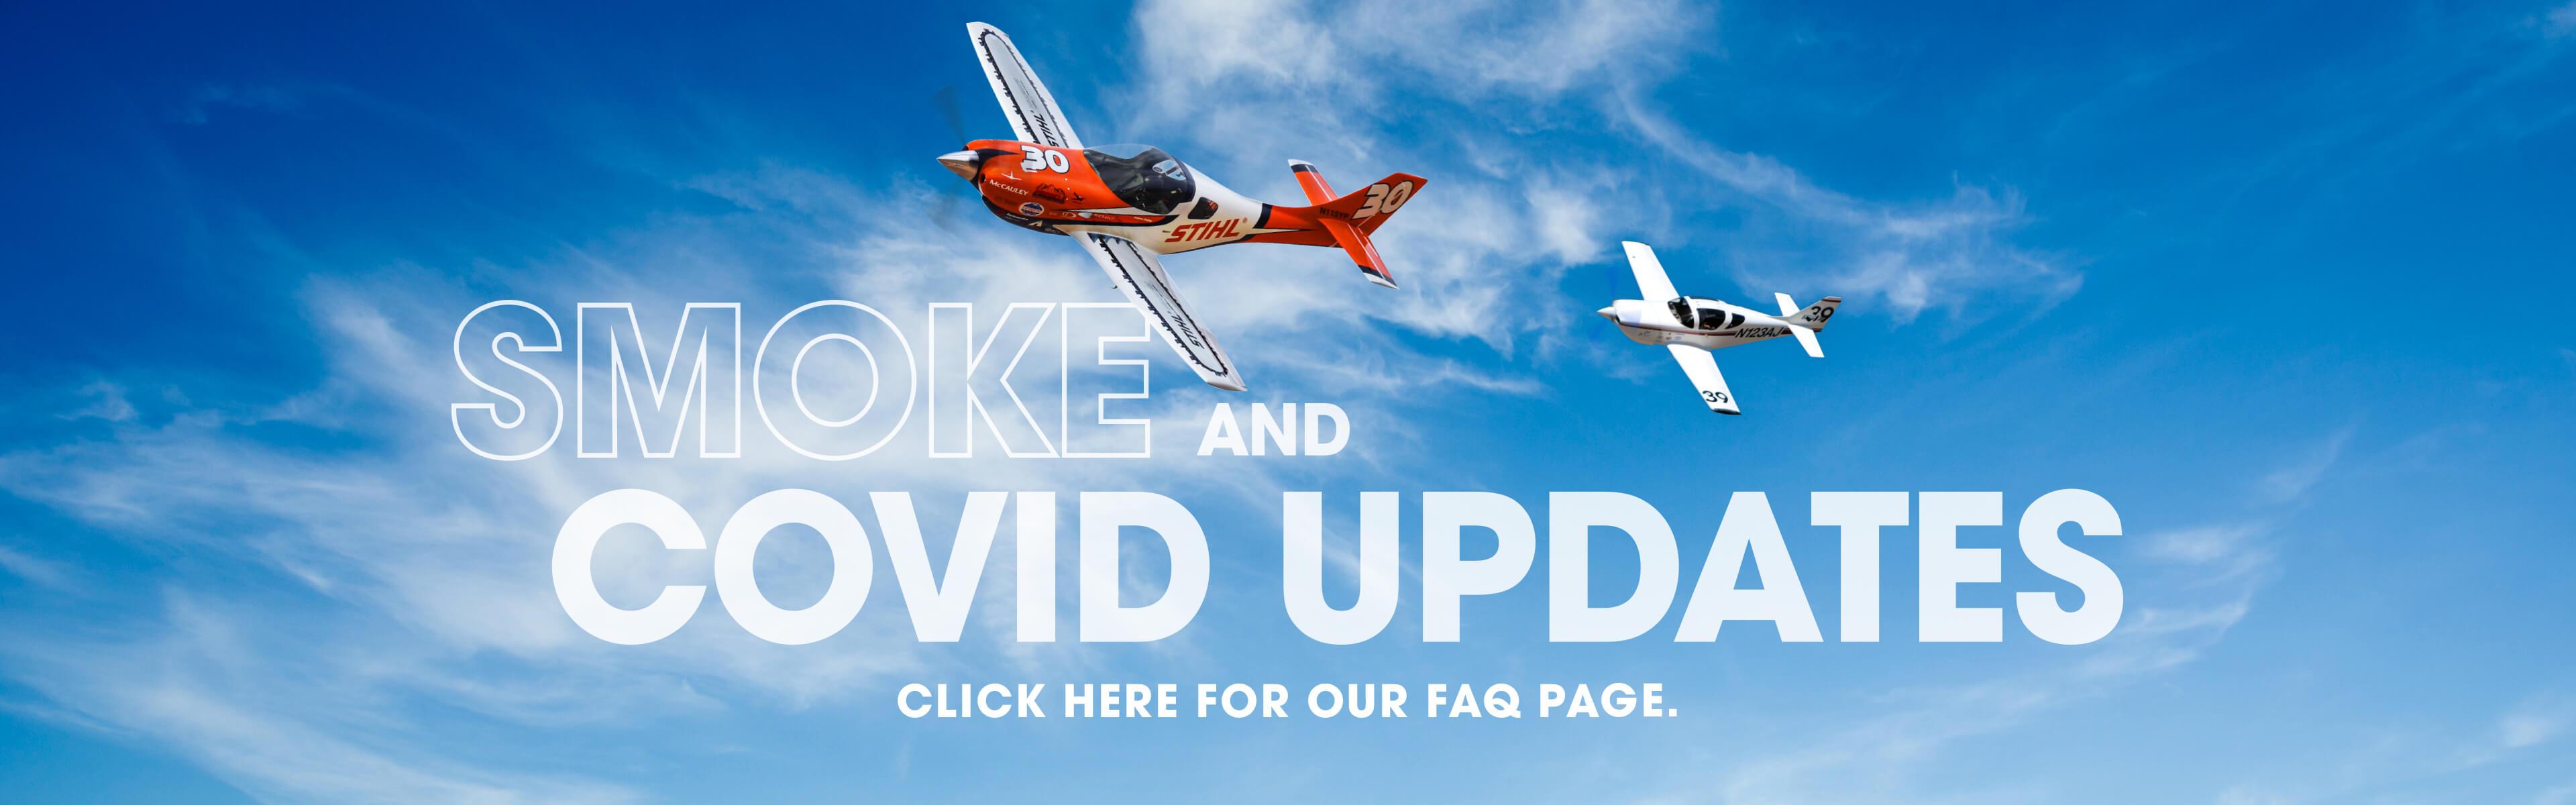 Reno Air Races Covid, Smoke and Tickets FAQ